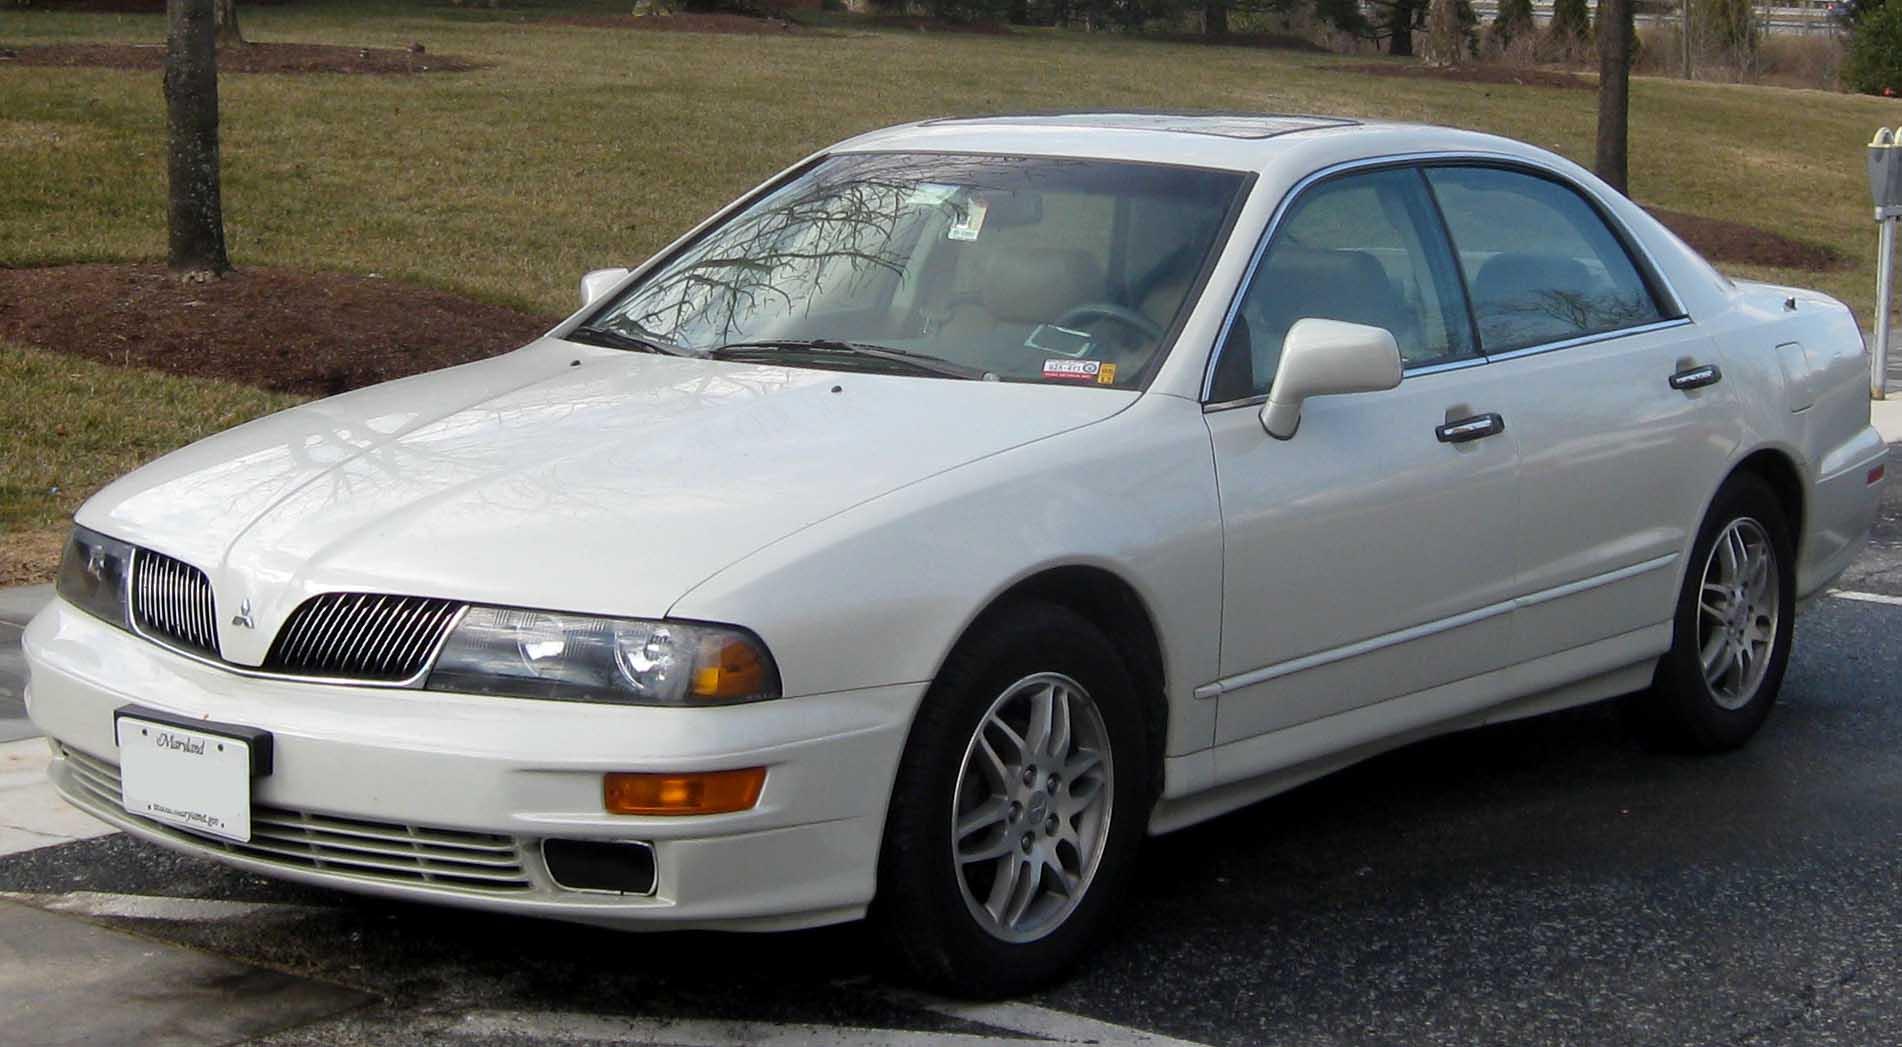 2002 Mitsubishi Diamante Partsopen